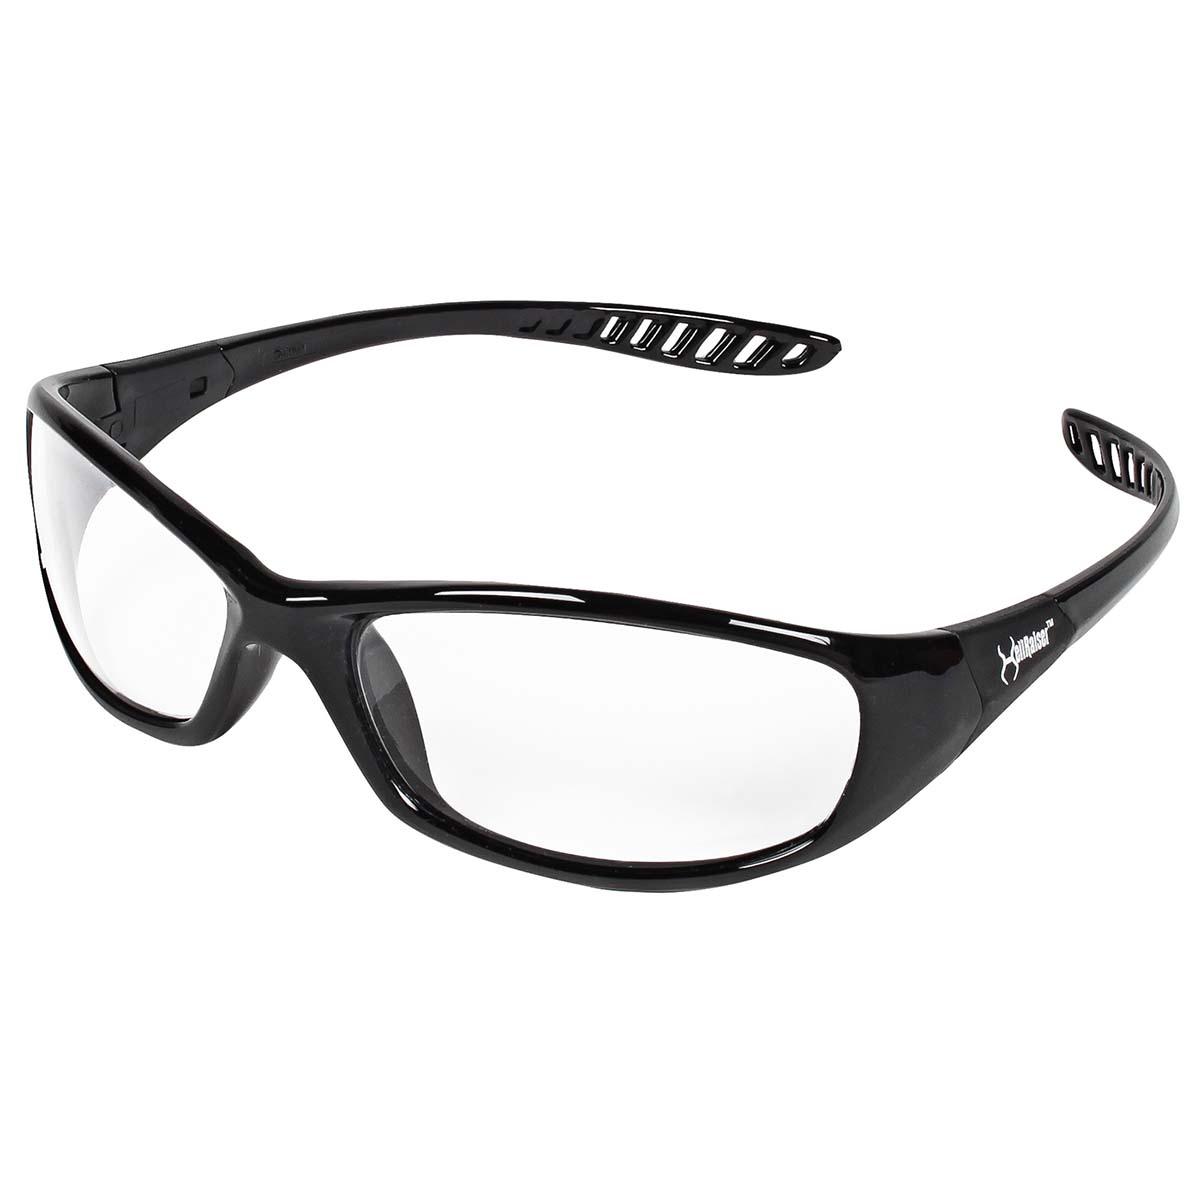 c09357f0474 Jackson Safety V40 Hellraiser Safety Glasses (28615)